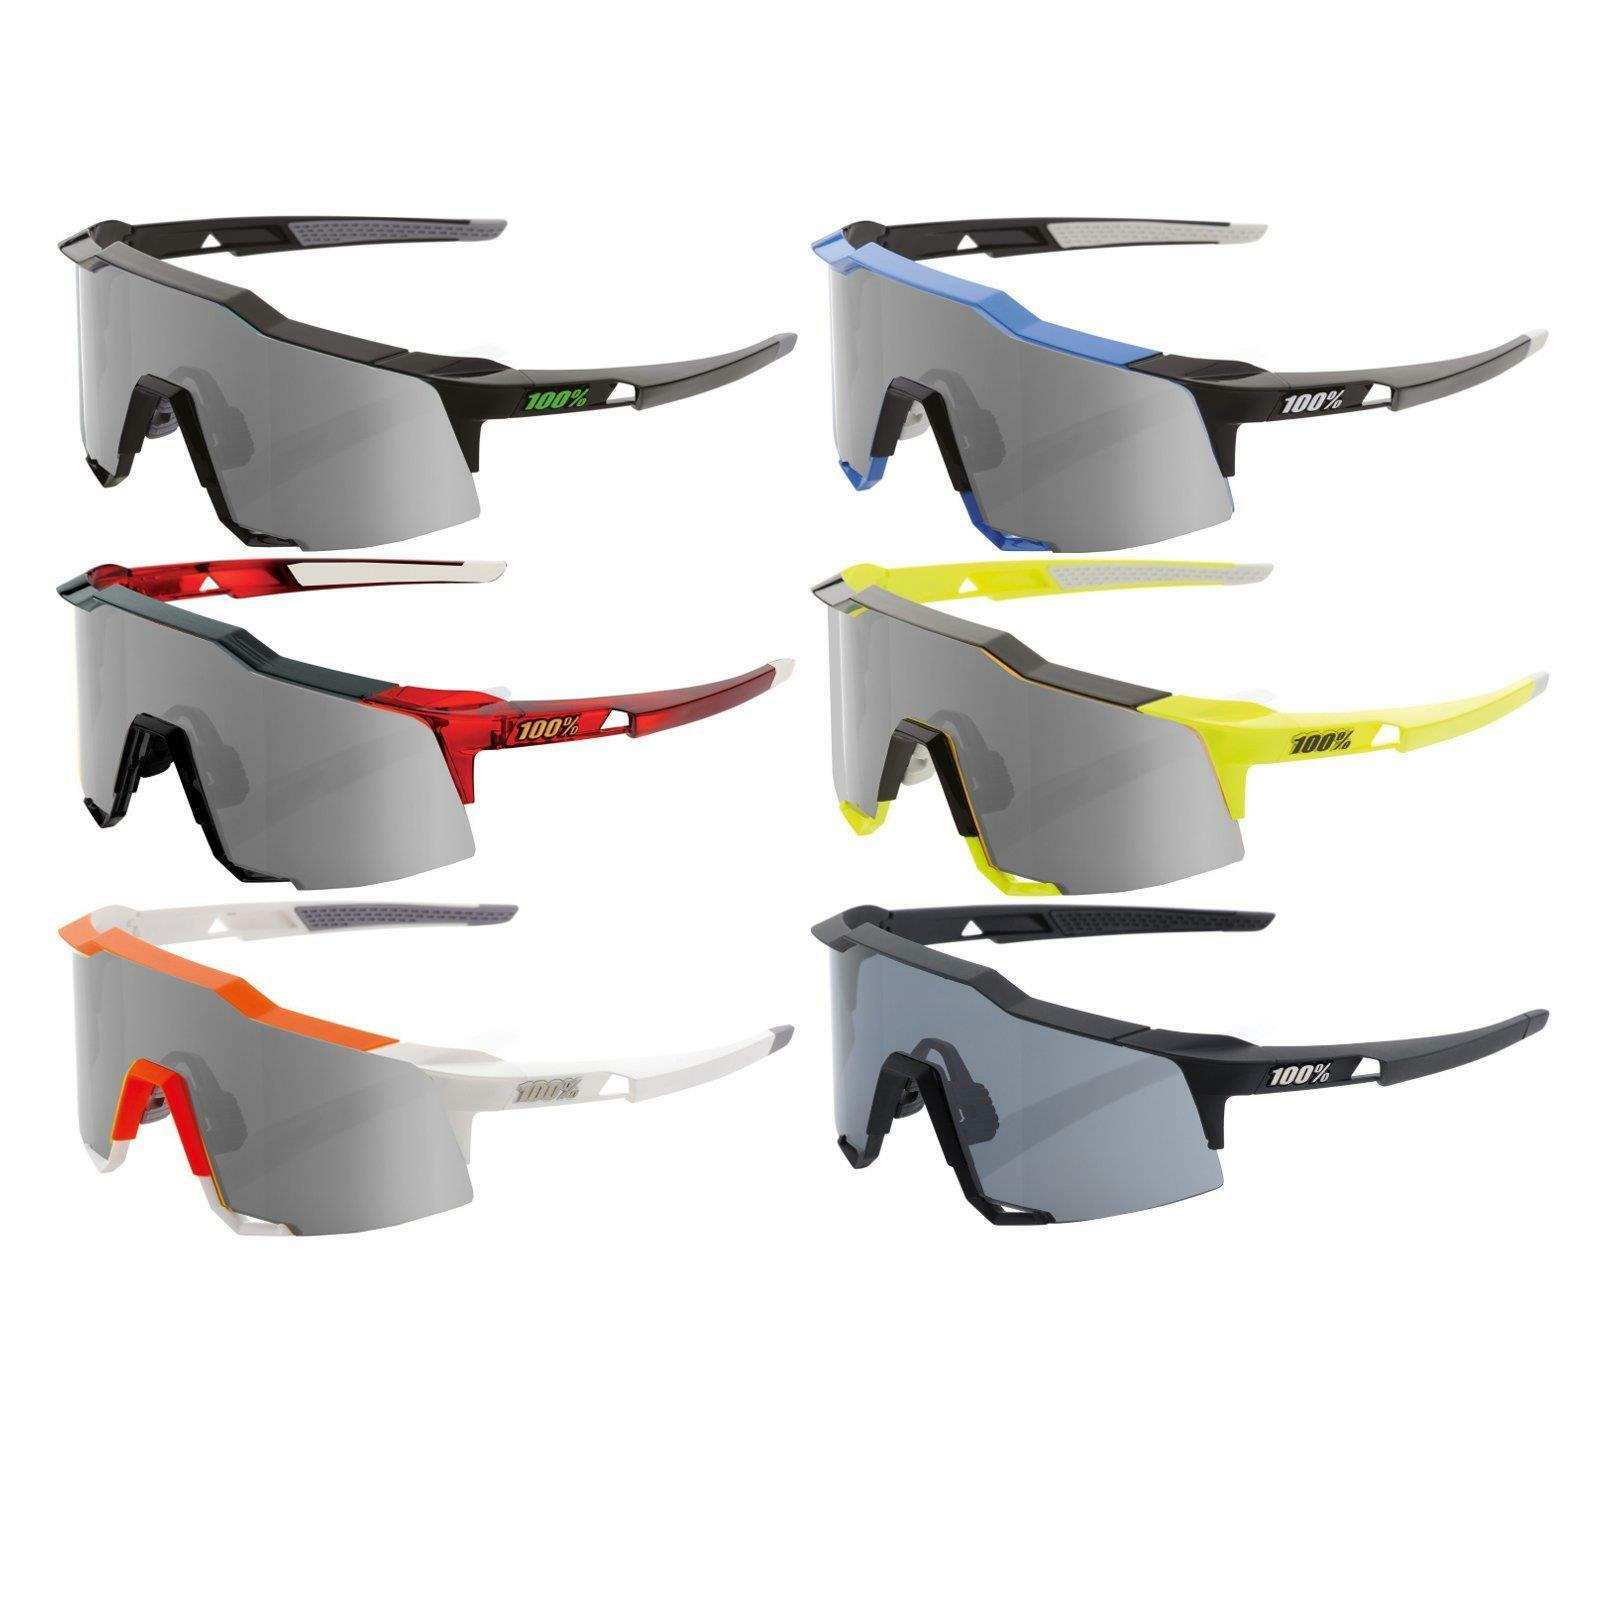 100% Prozent Speedcraft Sonnen Brille Smoke grey MTB Road Bike Fahrrad Megol Rad